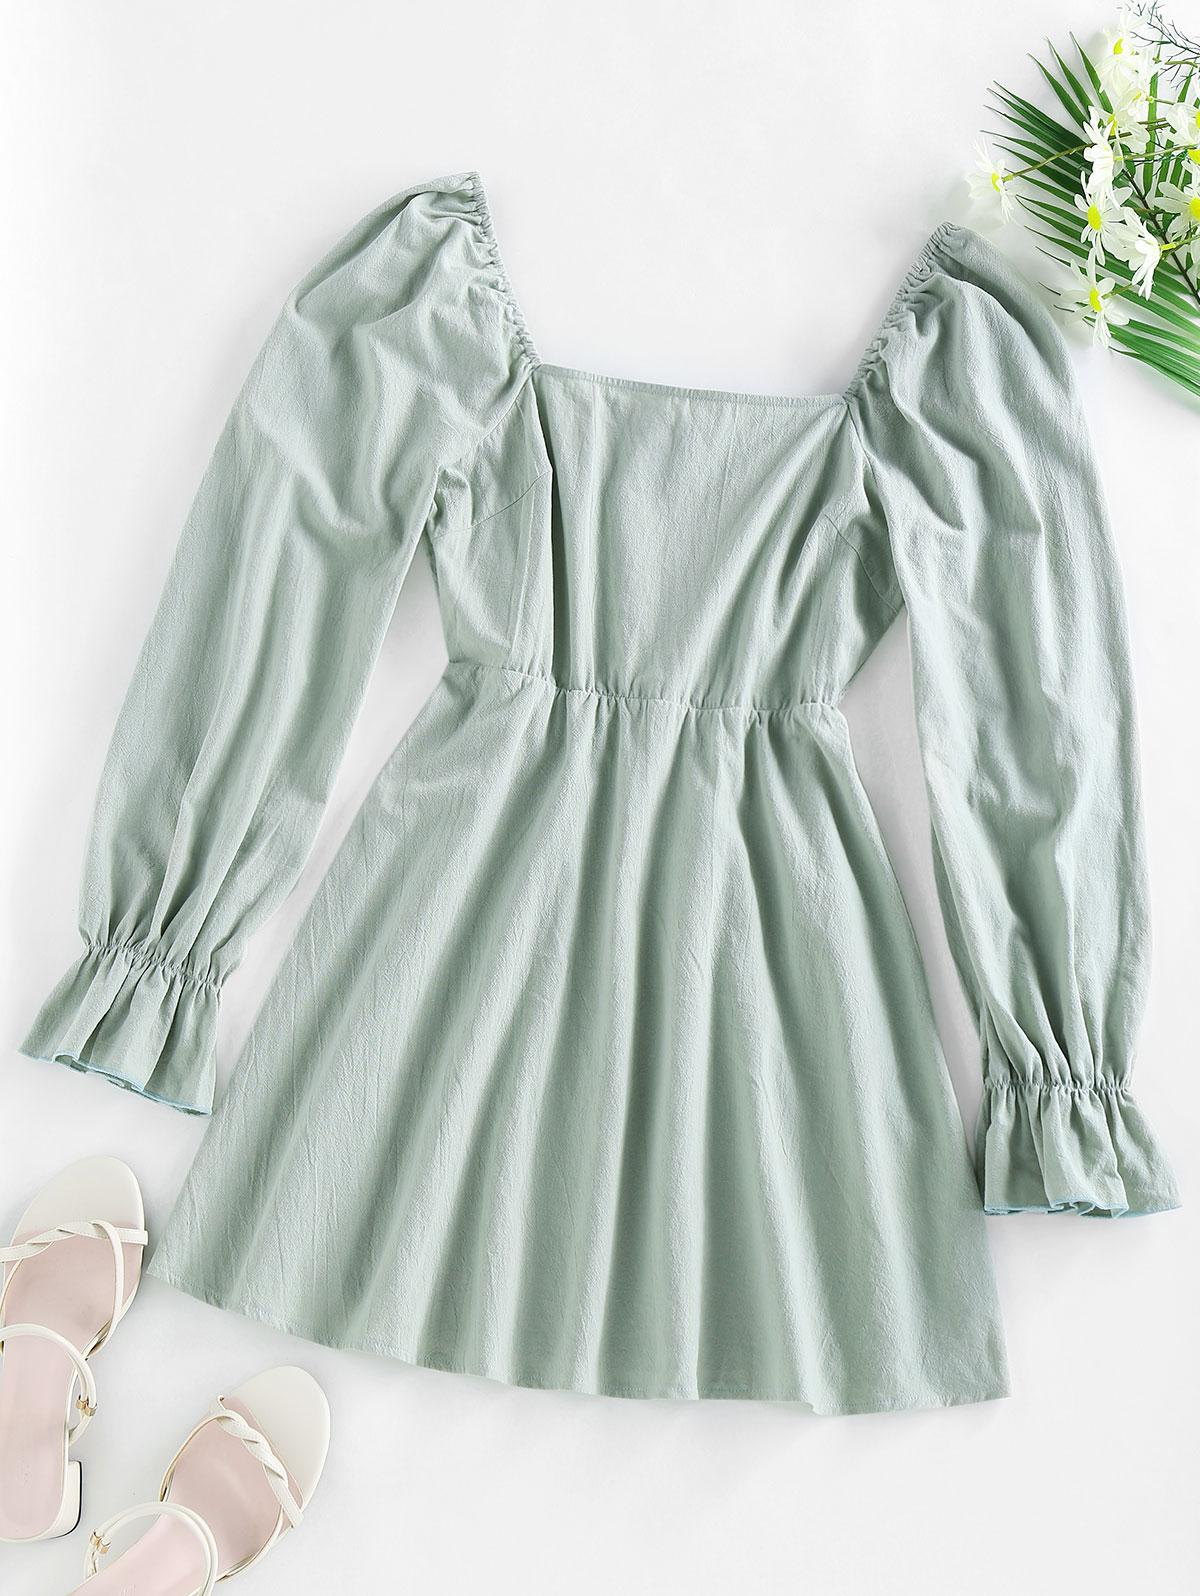 ZAFUL Poet Sleeve Mini Flare Dress